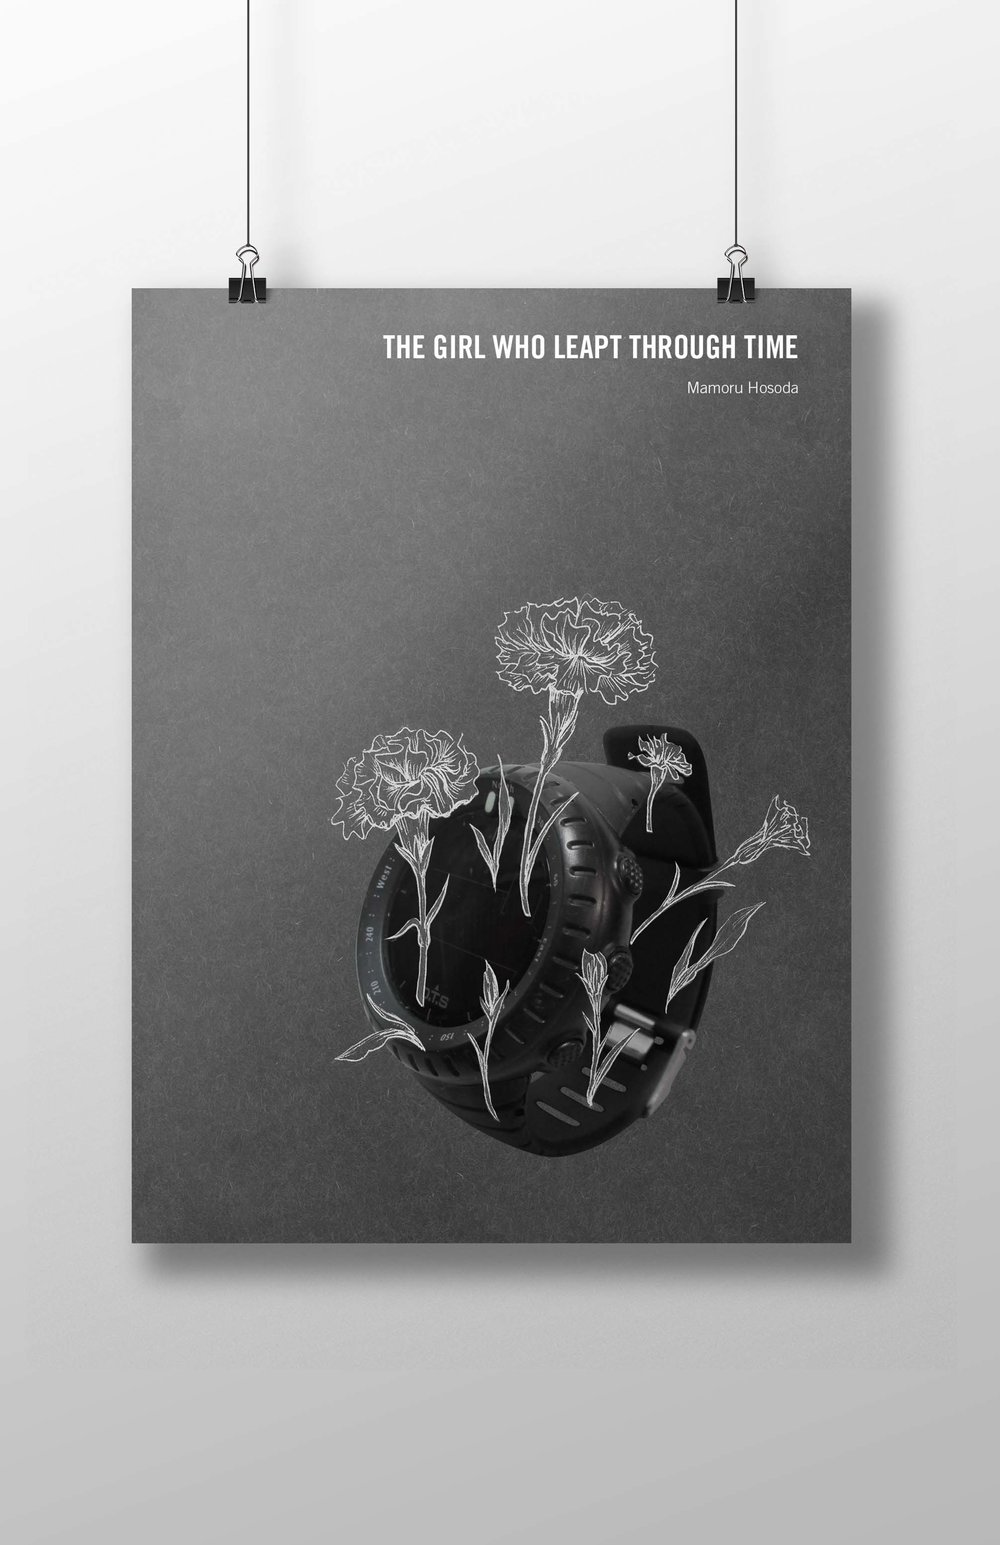 poster_mockup_TIME LEAP 11x17.jpg